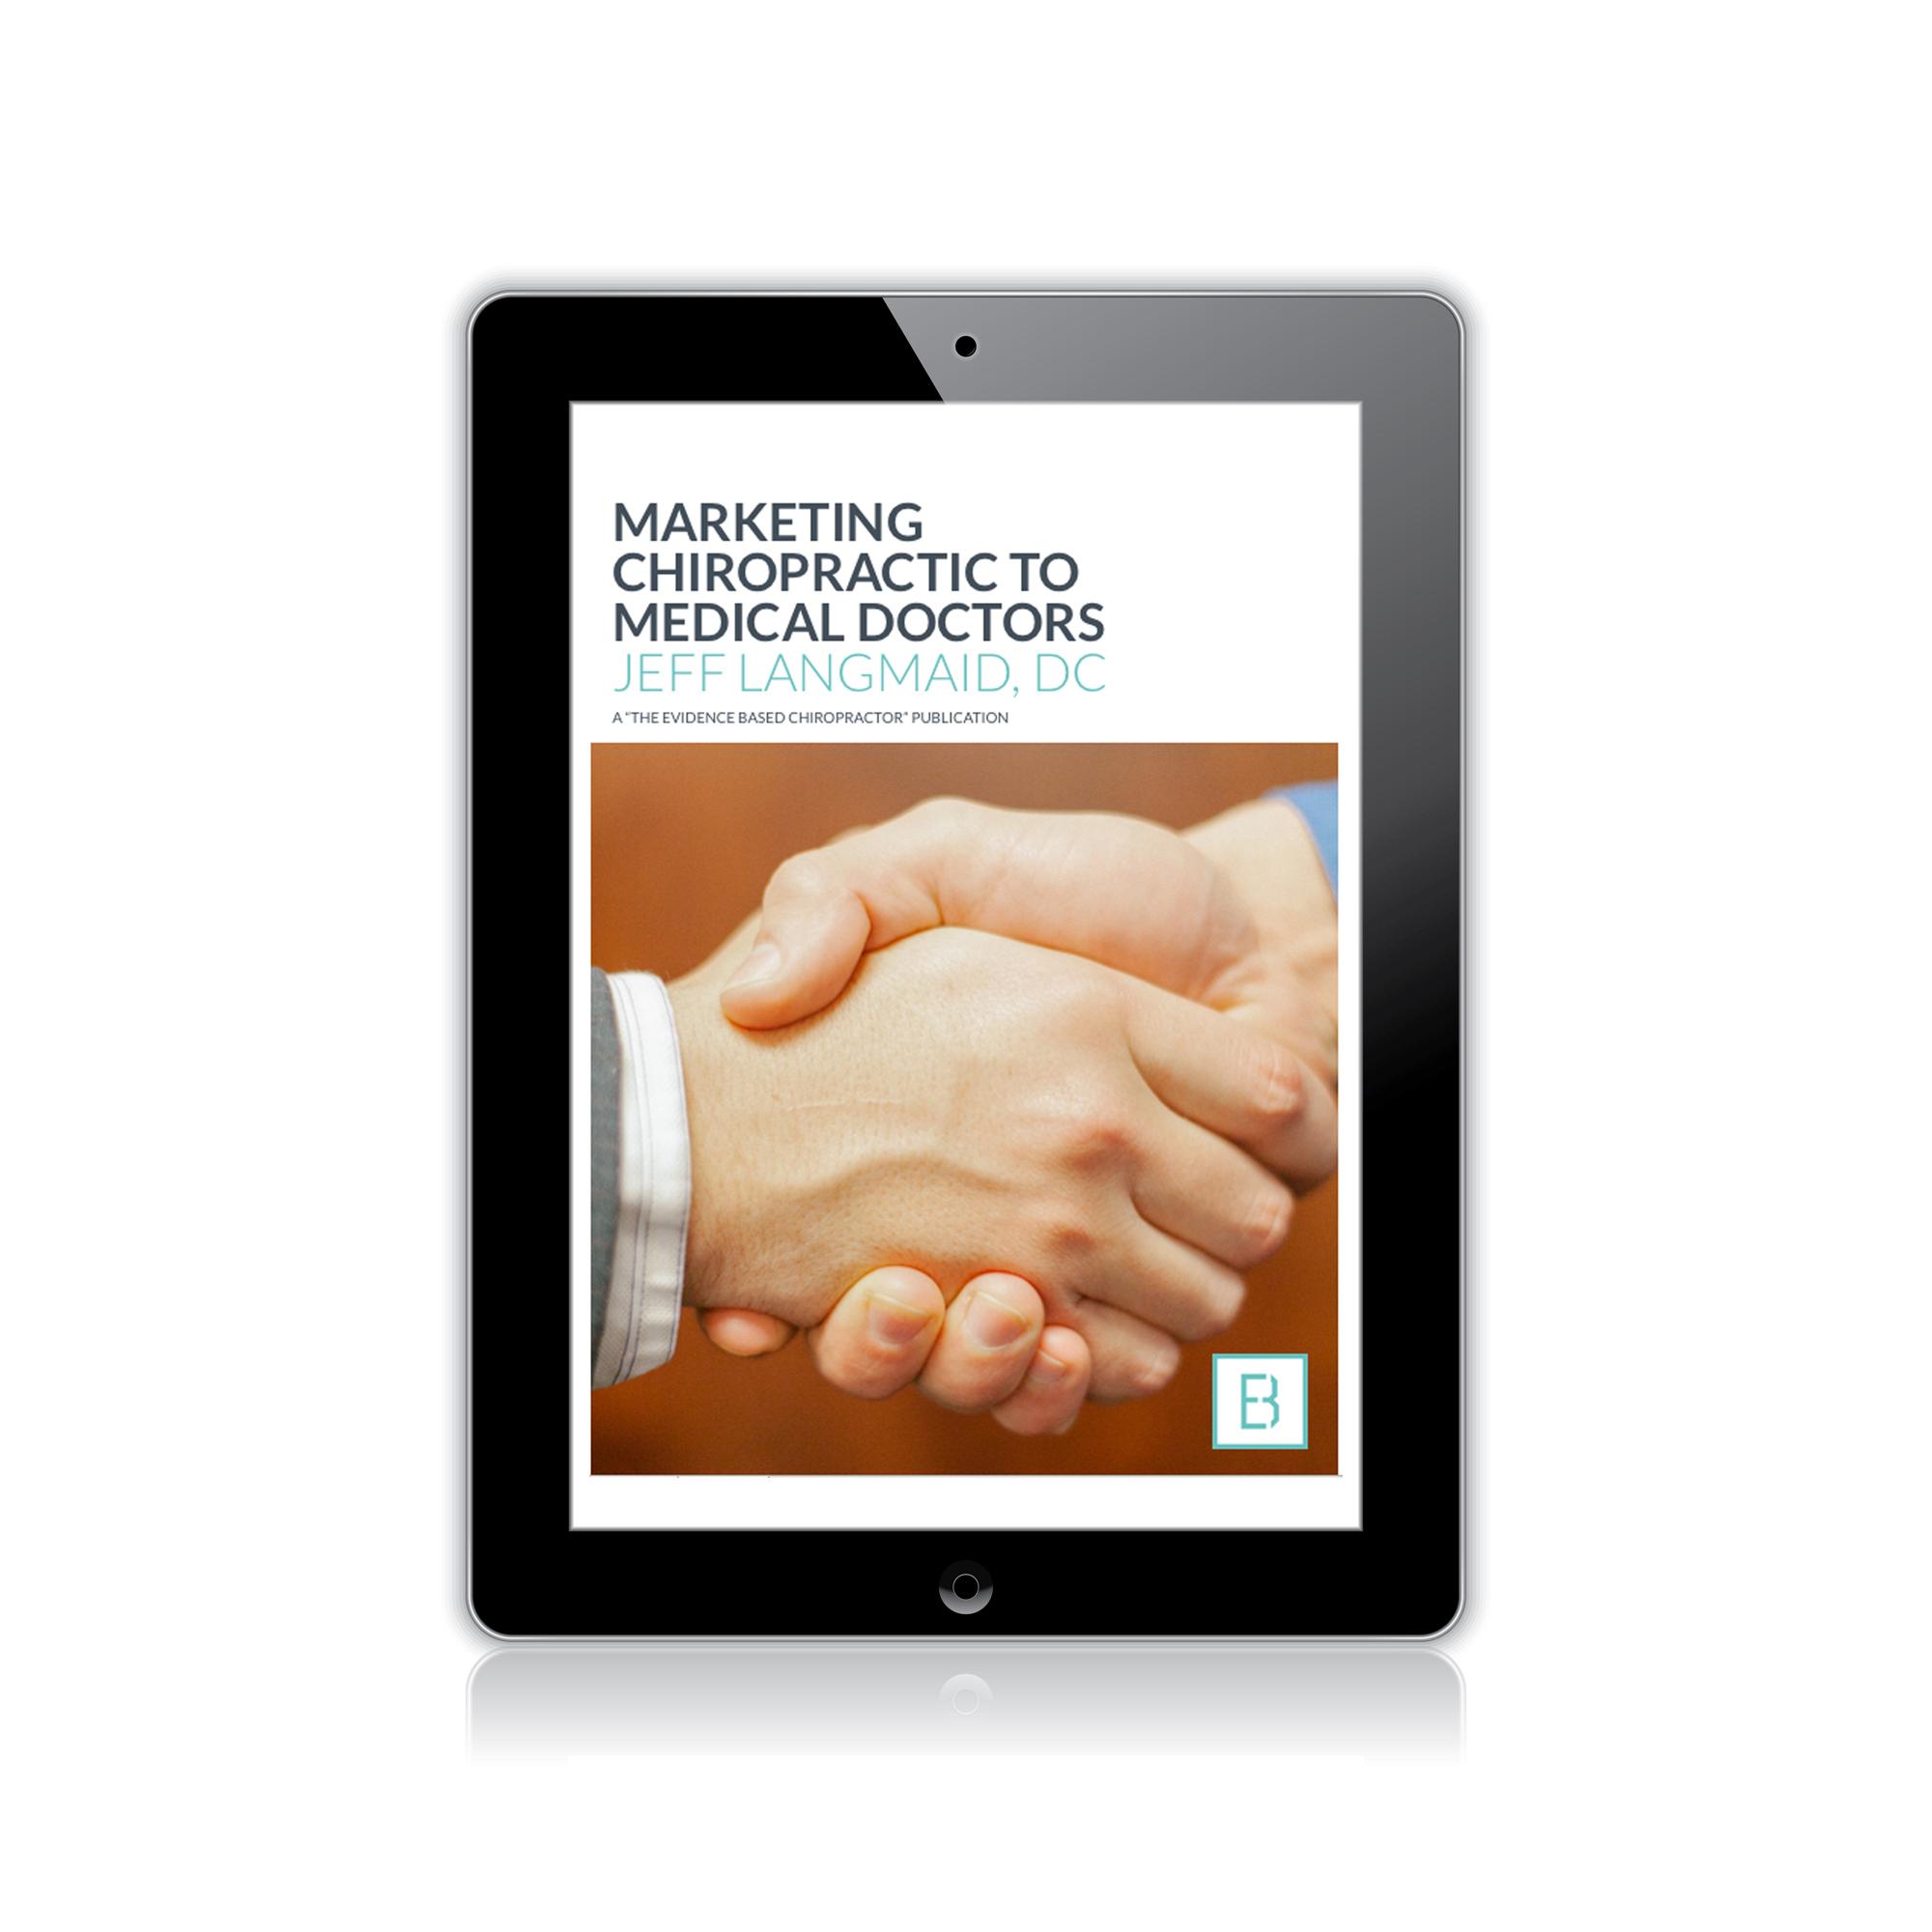 chiropractic-marketing-book.jpg